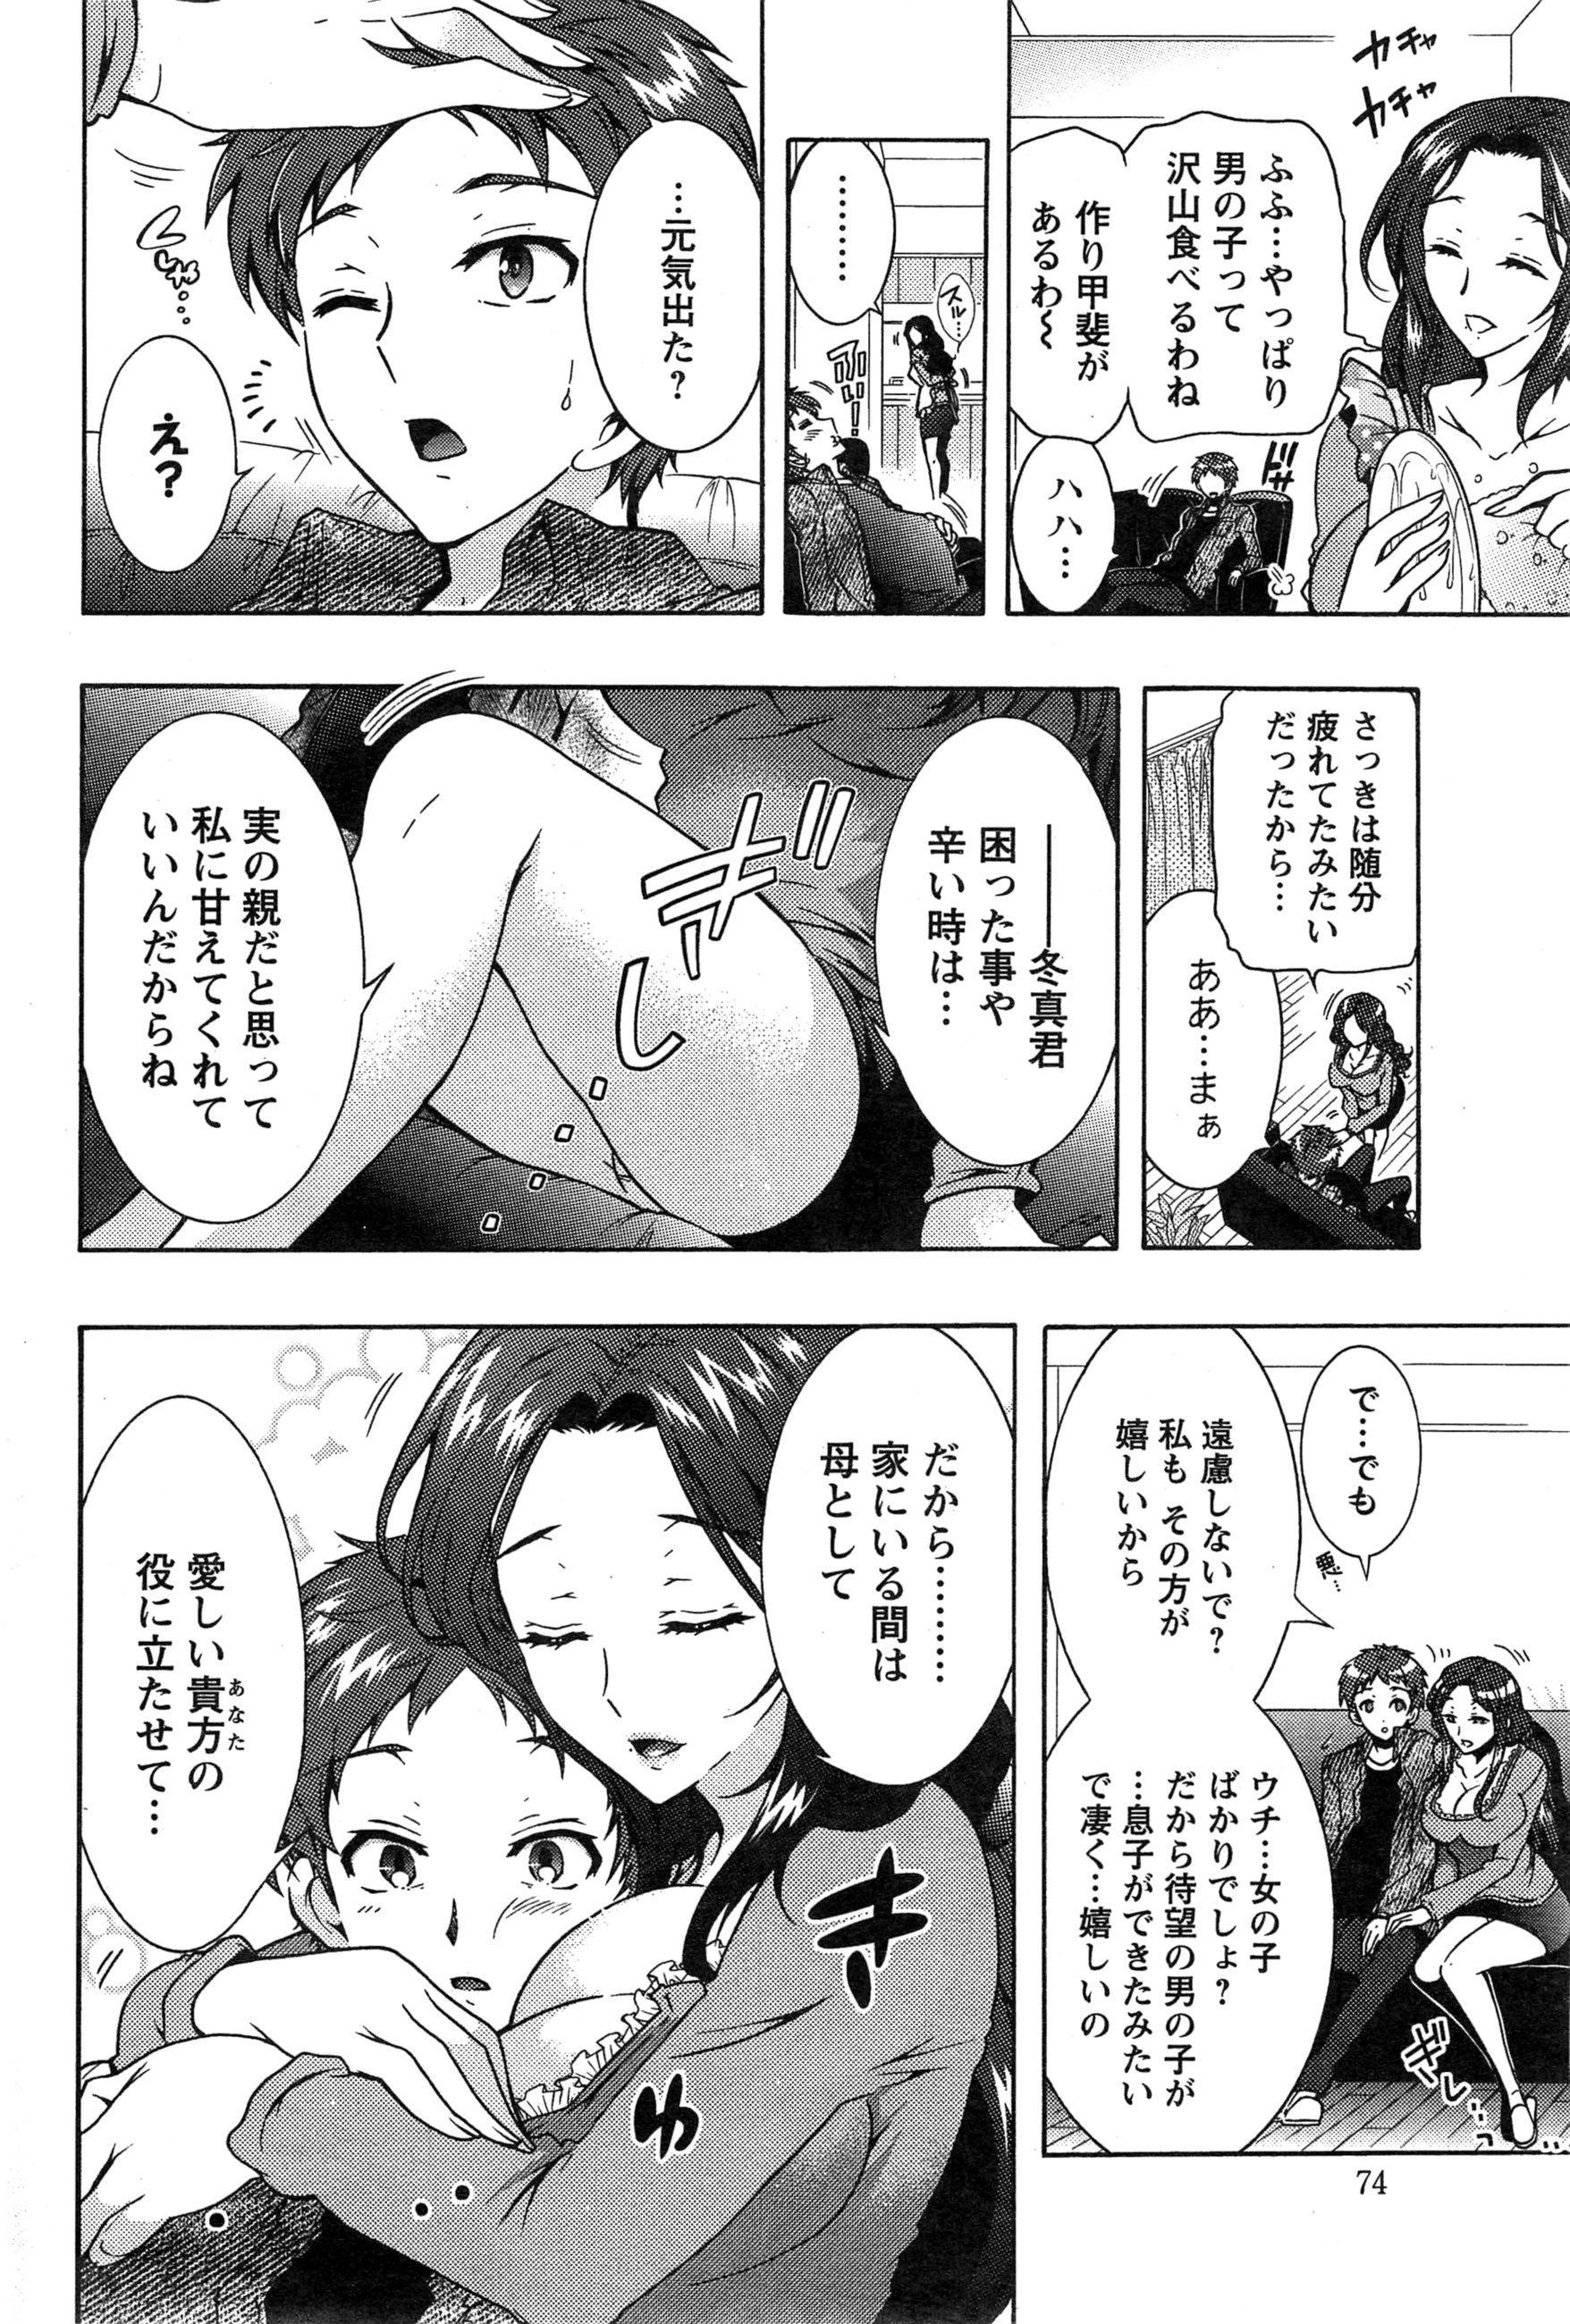 [Honda Arima] Sanshimai no Omocha - The Slave of Three Sisters Ch. 1-6 46